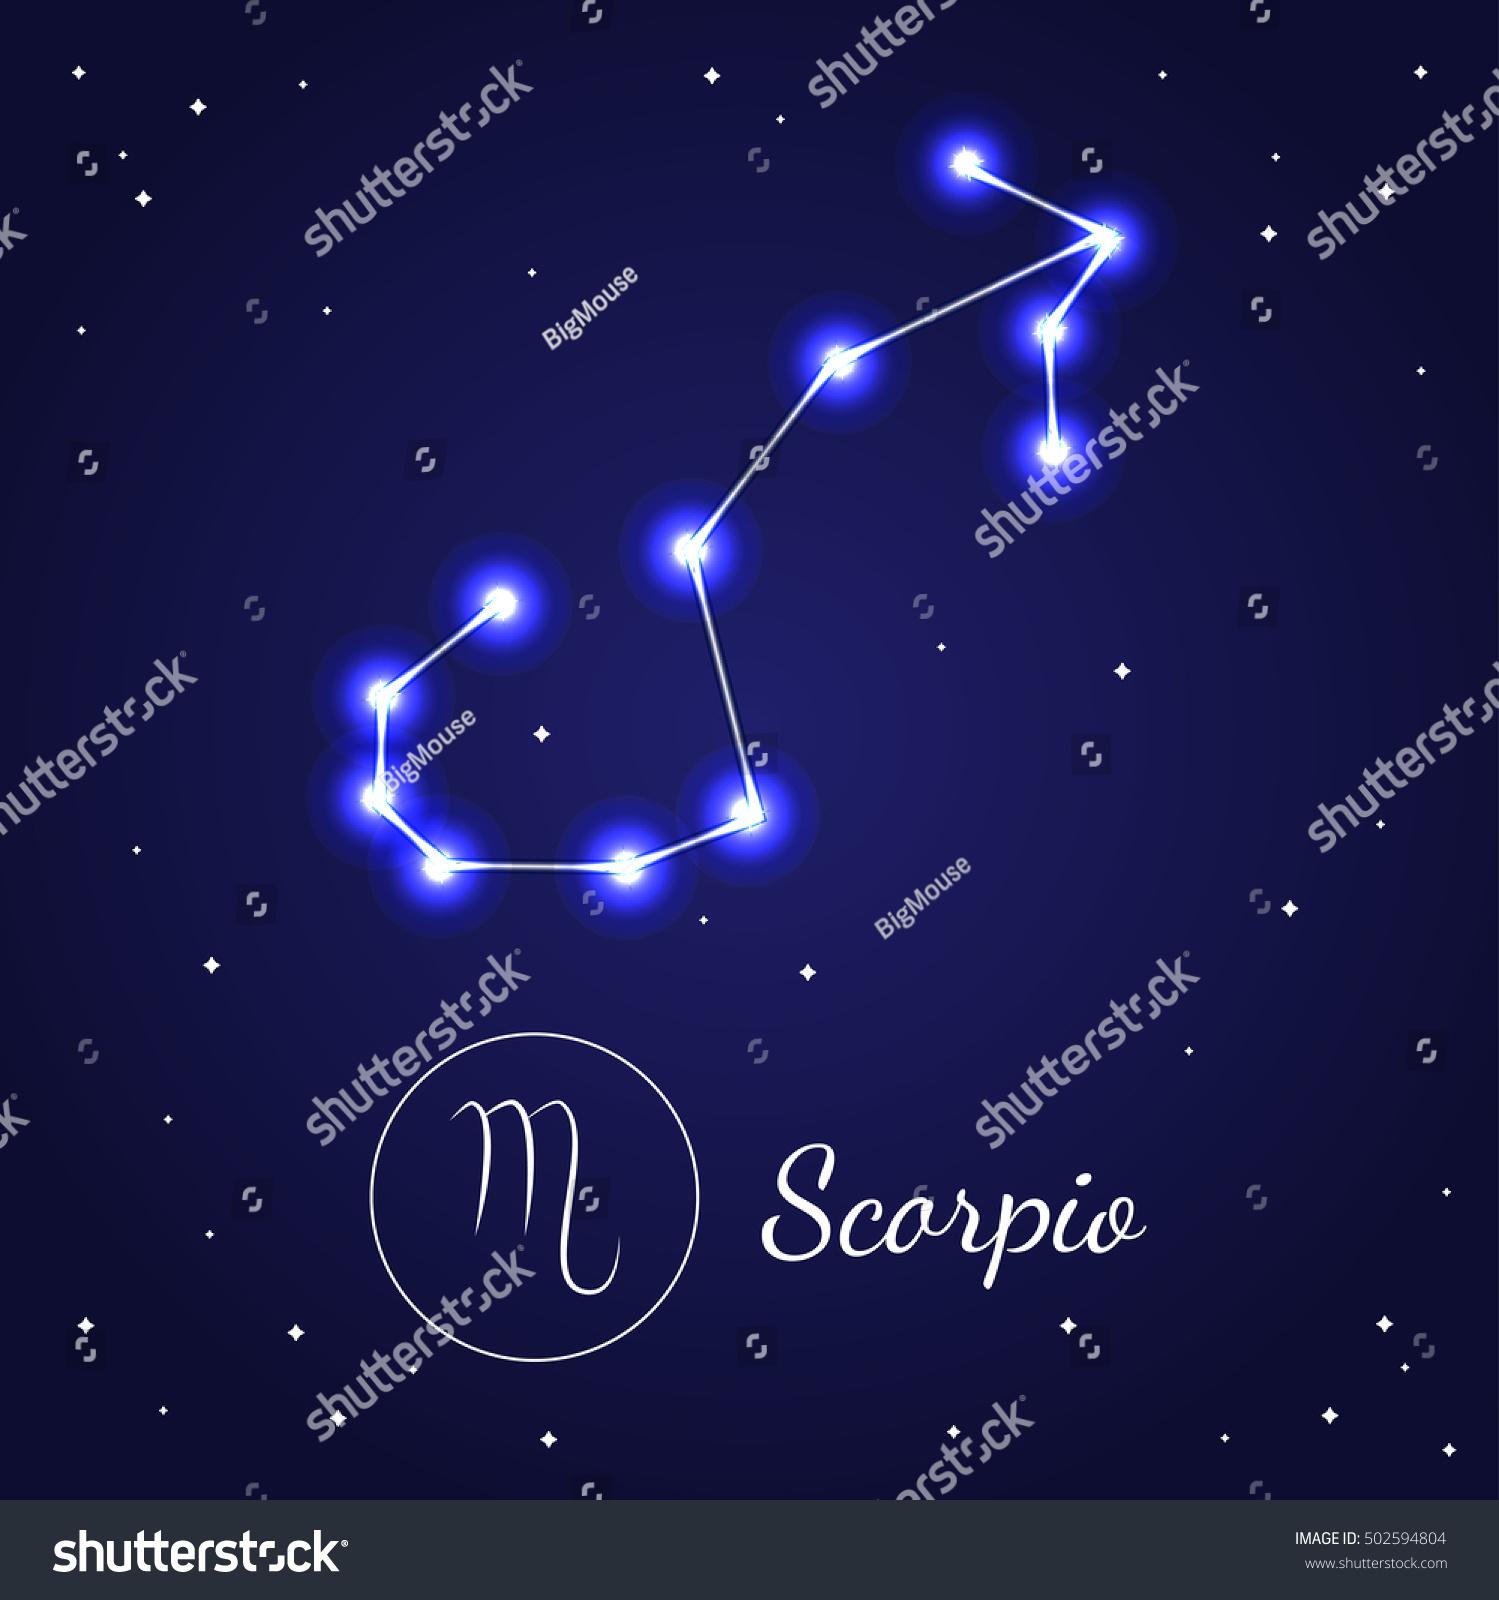 scorpion wallpaper